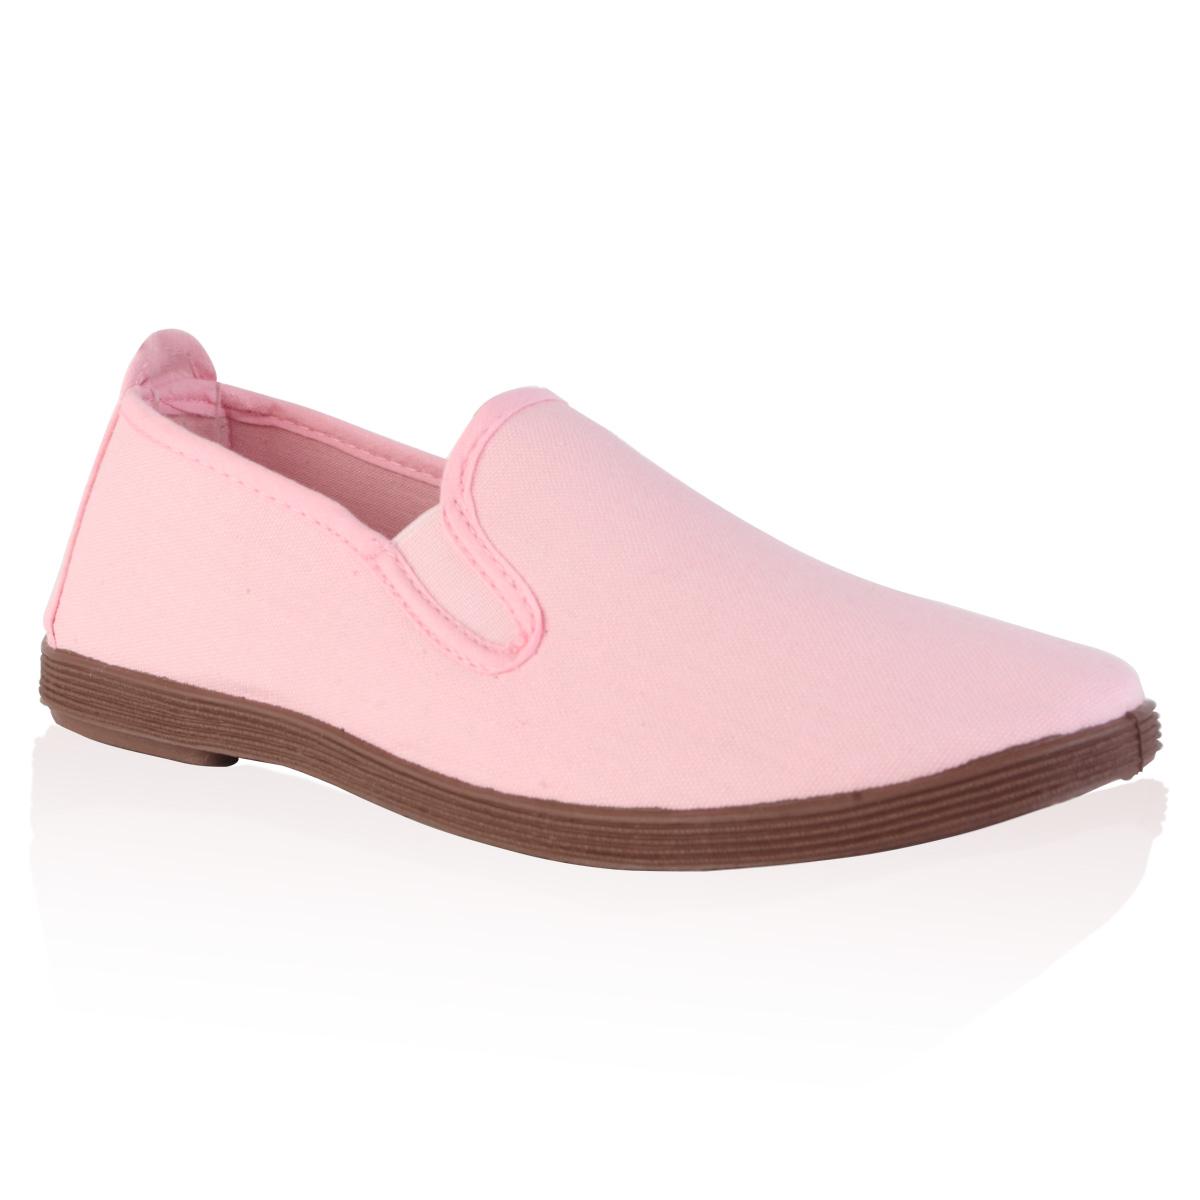 new womens light pink flat plimsoll slip on summer